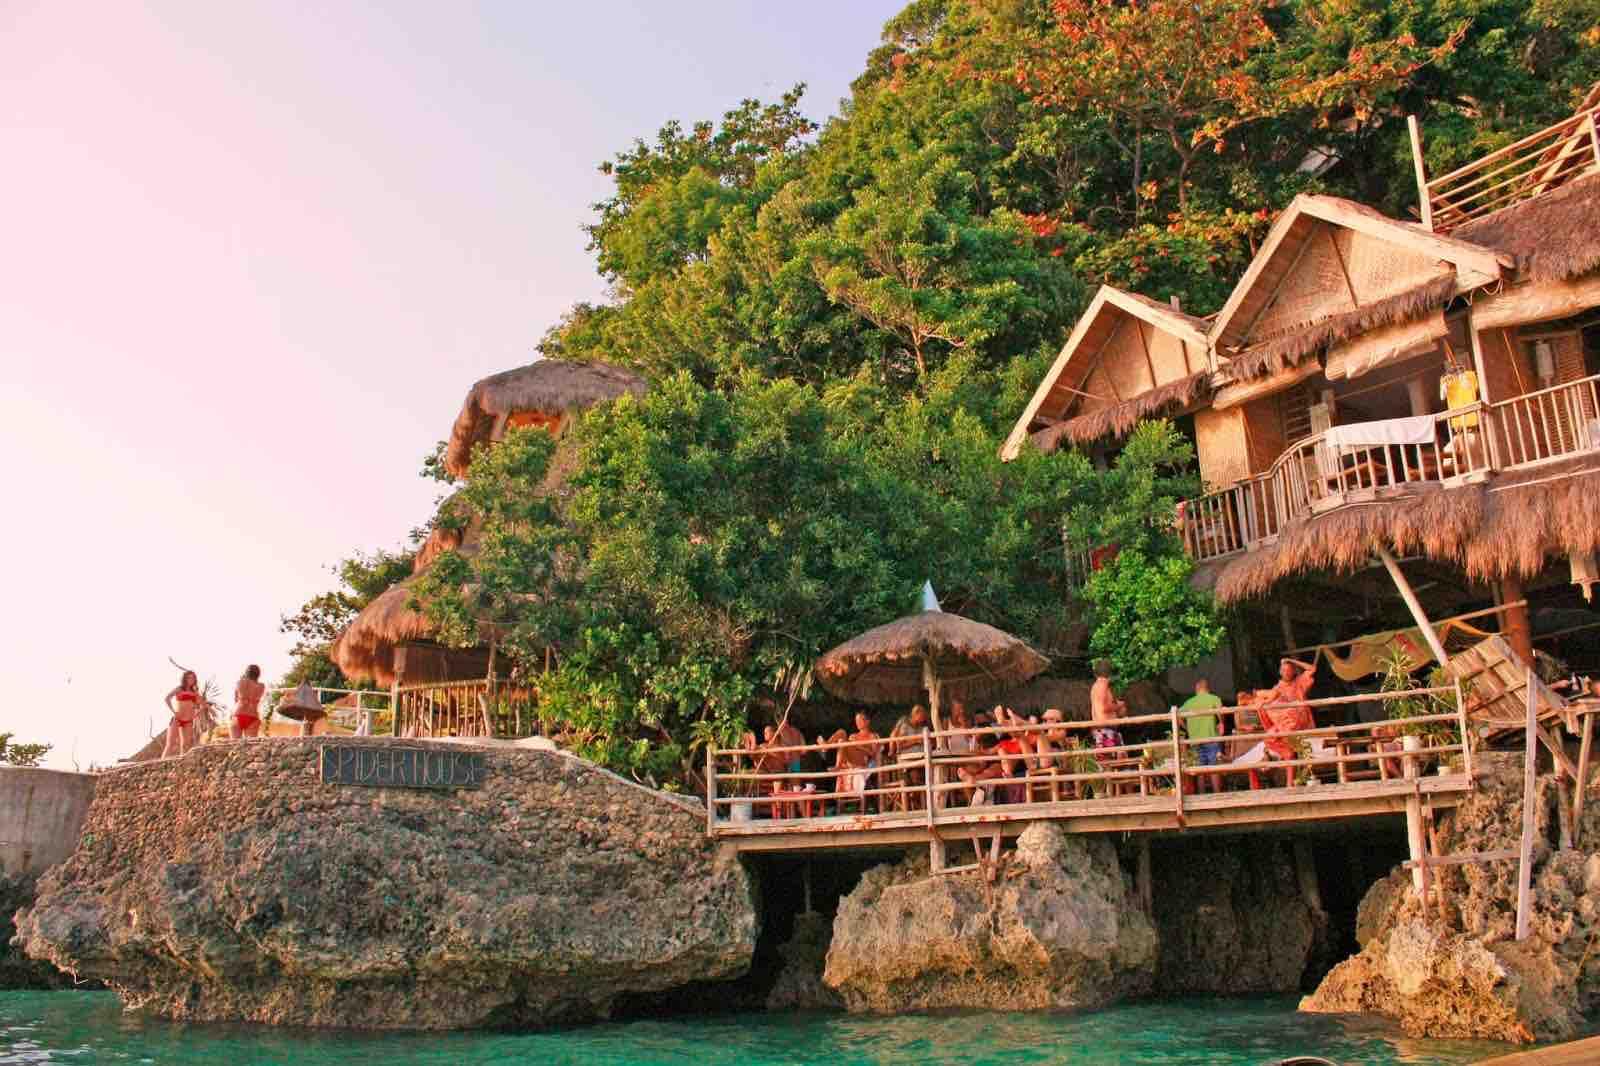 Spider House Resort Boracay - AspirantSG